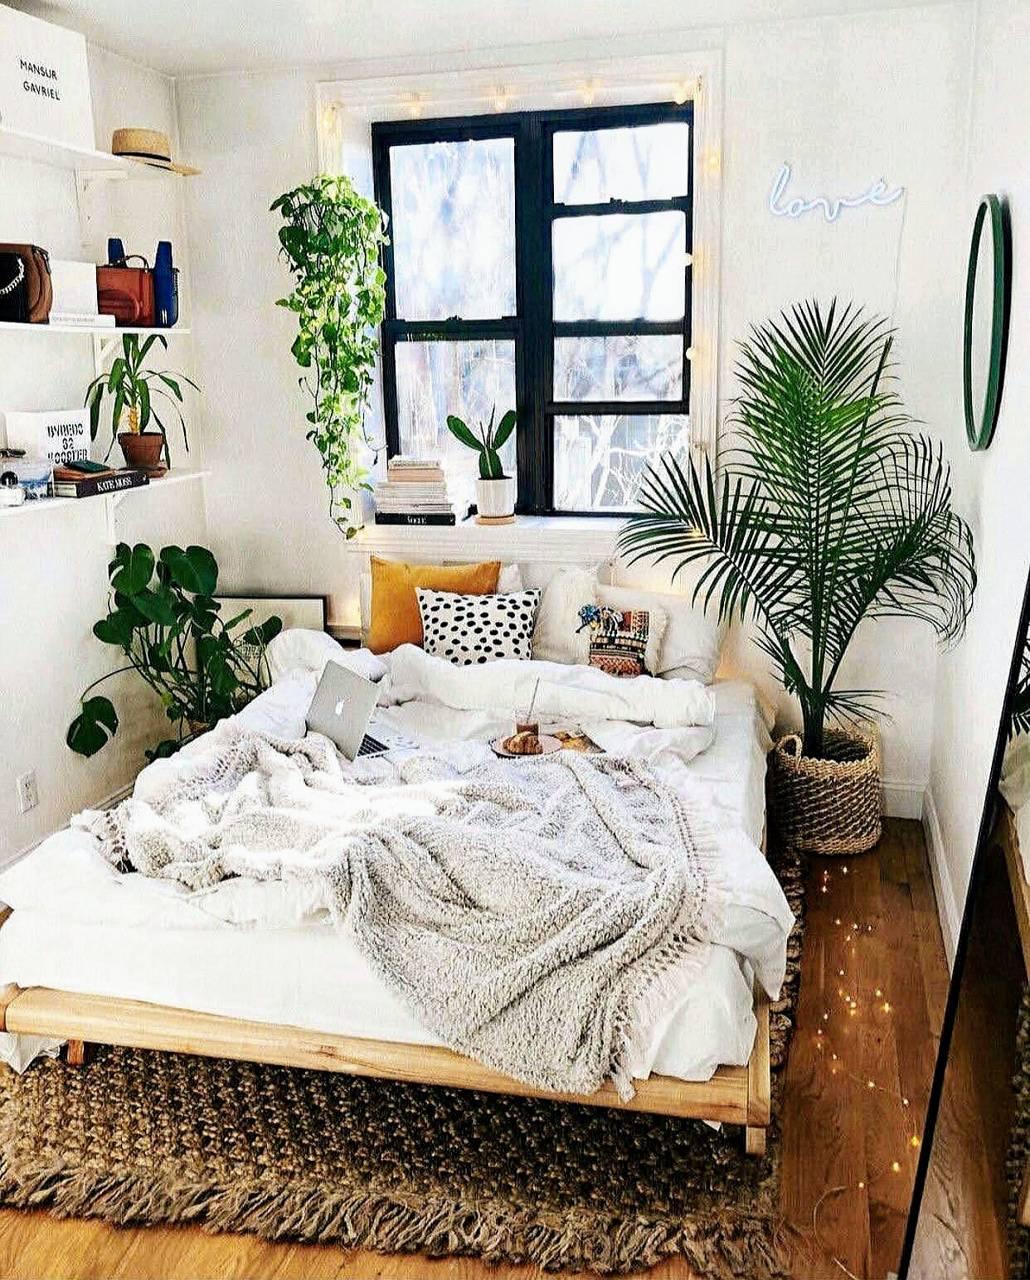 Small Bedroom Design Wallpaper By Lebonm37 Bd Free On Zedge